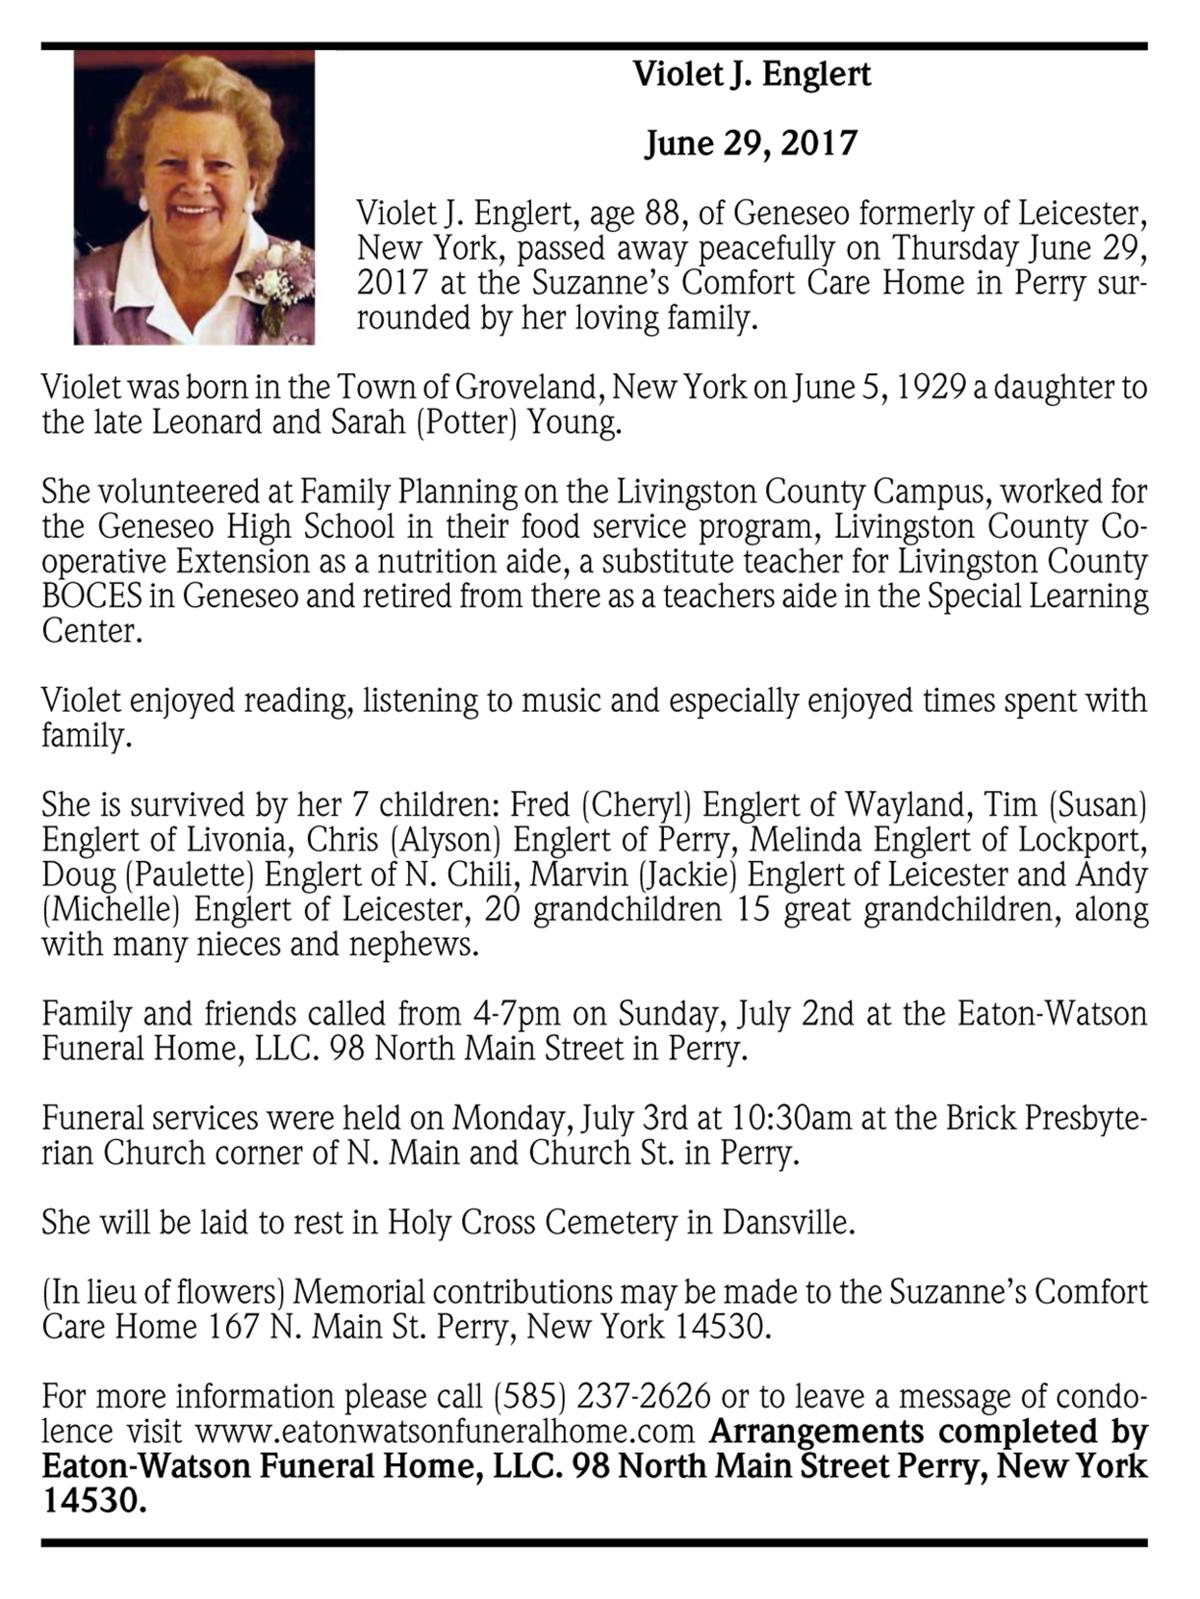 New york livingston county leicester - Violet J Englert June 29 2017 Passages Obituaries Gvpennysaver Com